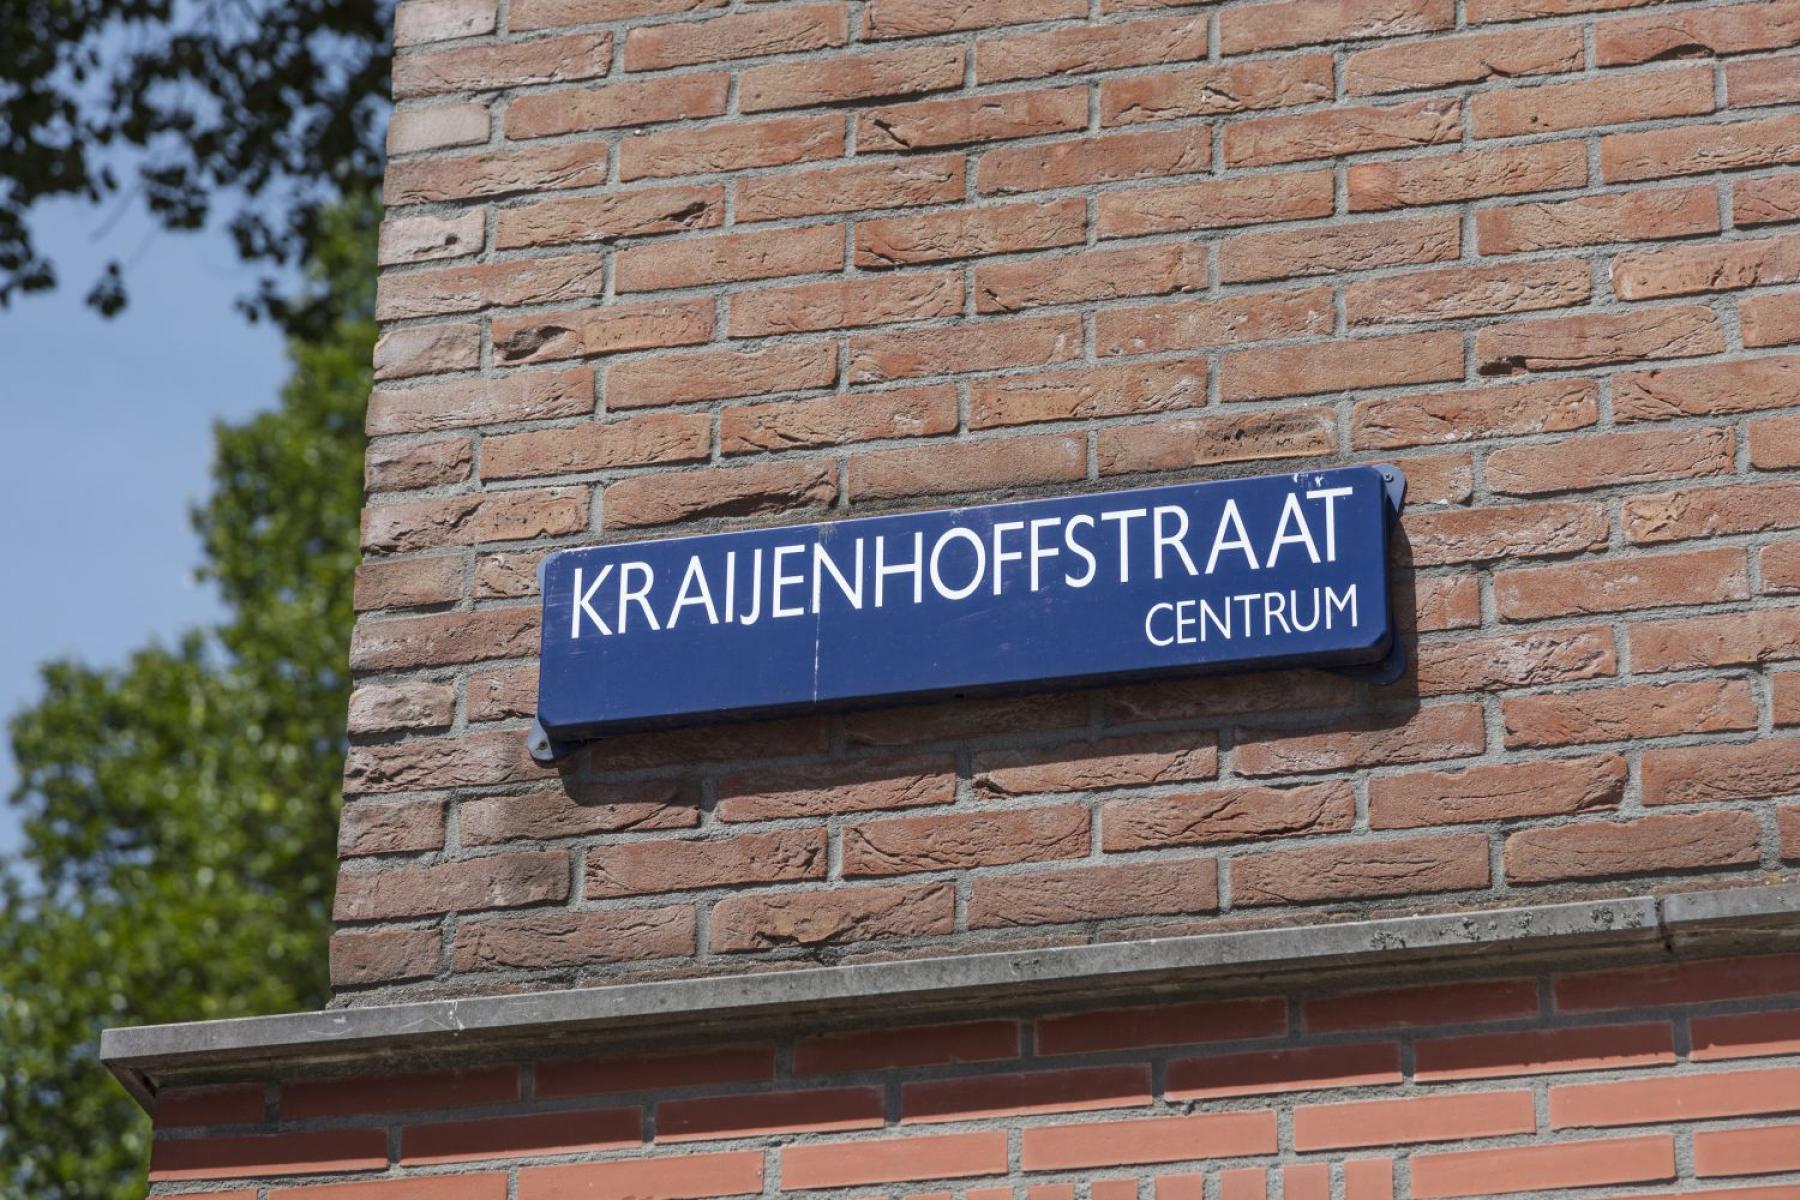 Rent office space Kraijenhoffstraat 137a, Amsterdam (4)